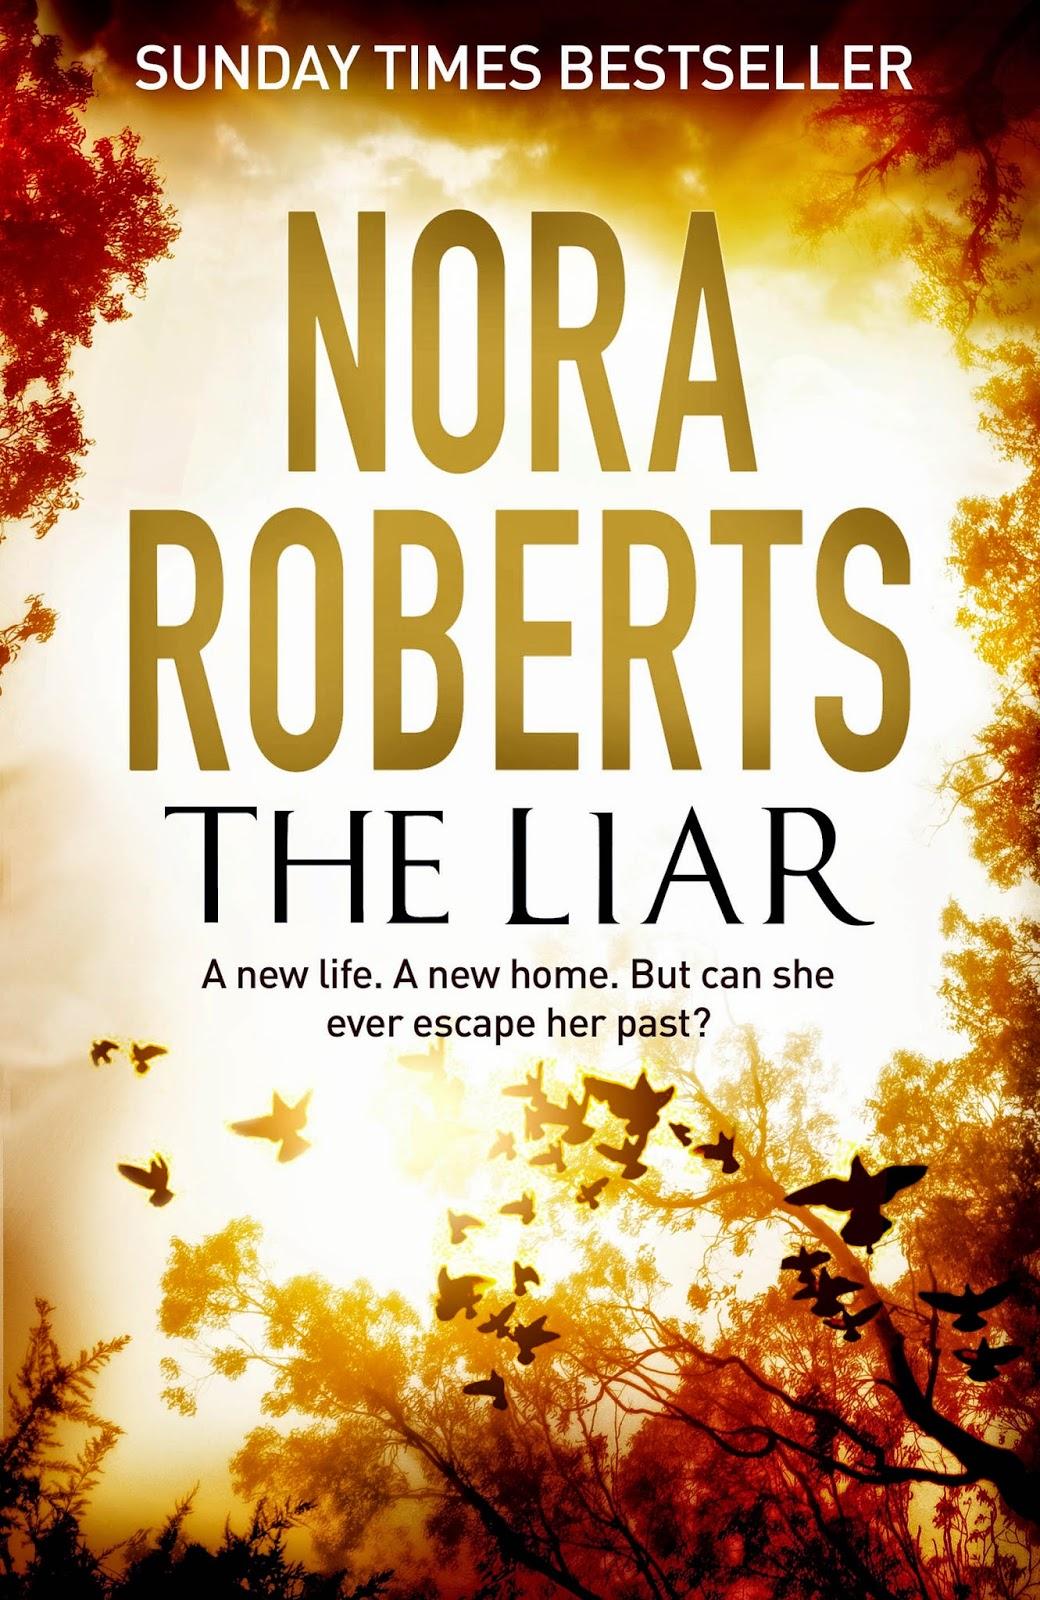 https://www.goodreads.com/book/show/23666117-the-liar